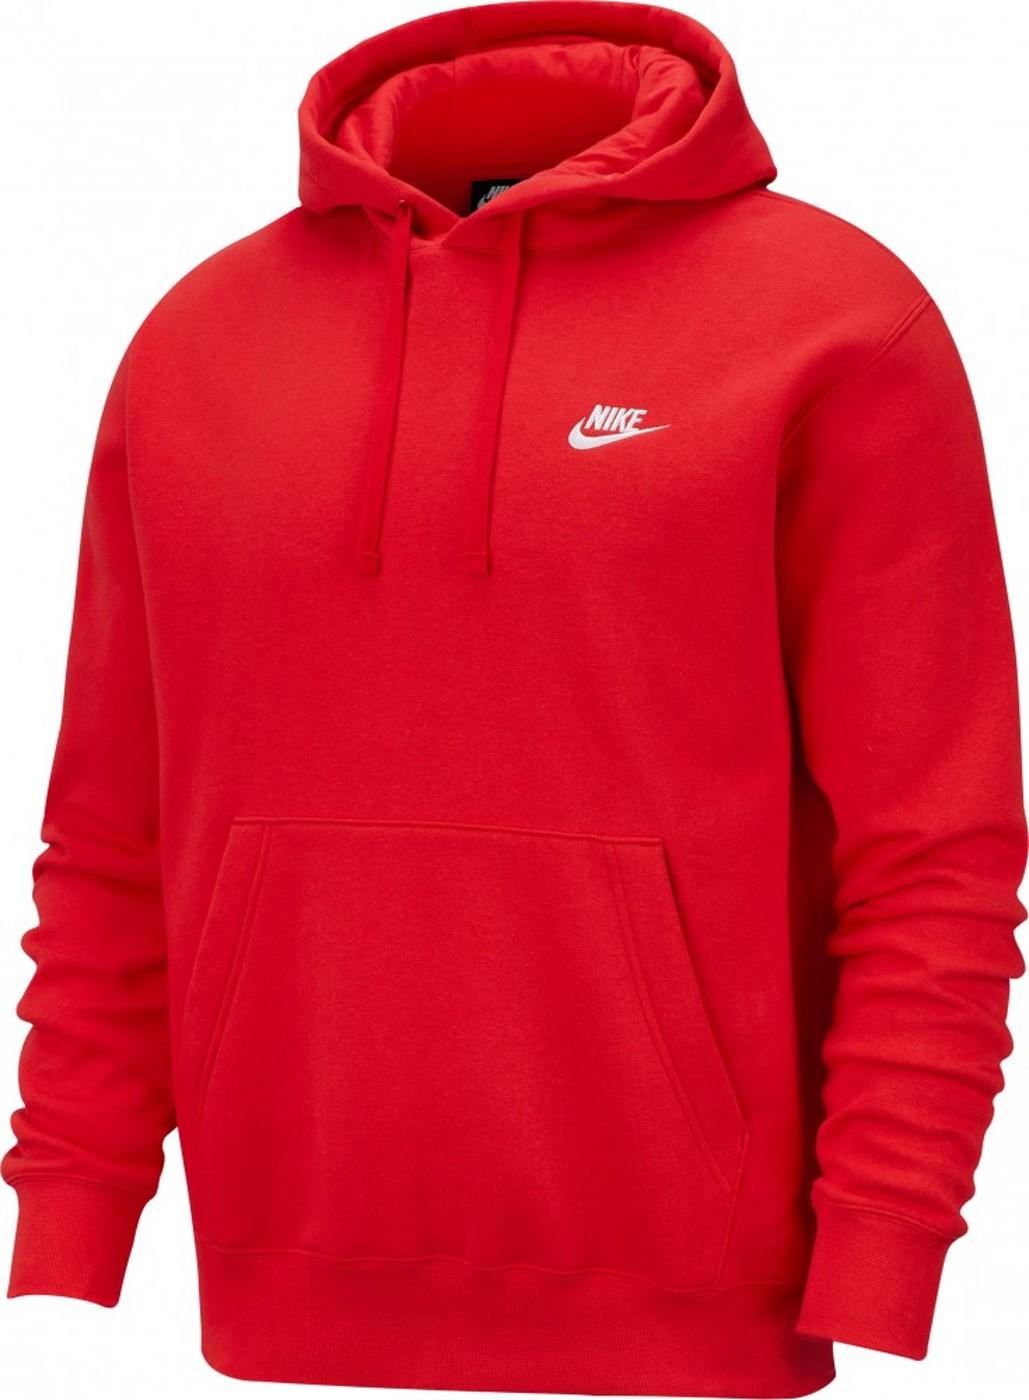 Nike Sportswear Club Fleece Pu - Herren